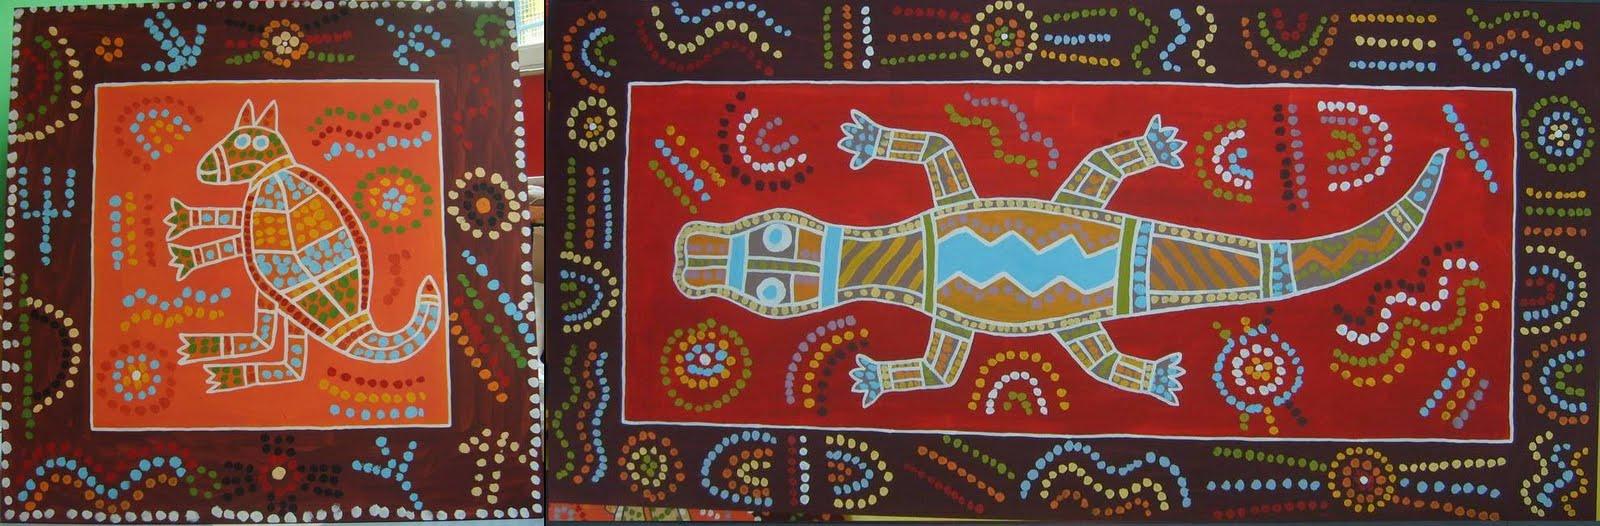 Jean yves andr kangourou crocodile maternelles for Peinture crocodile